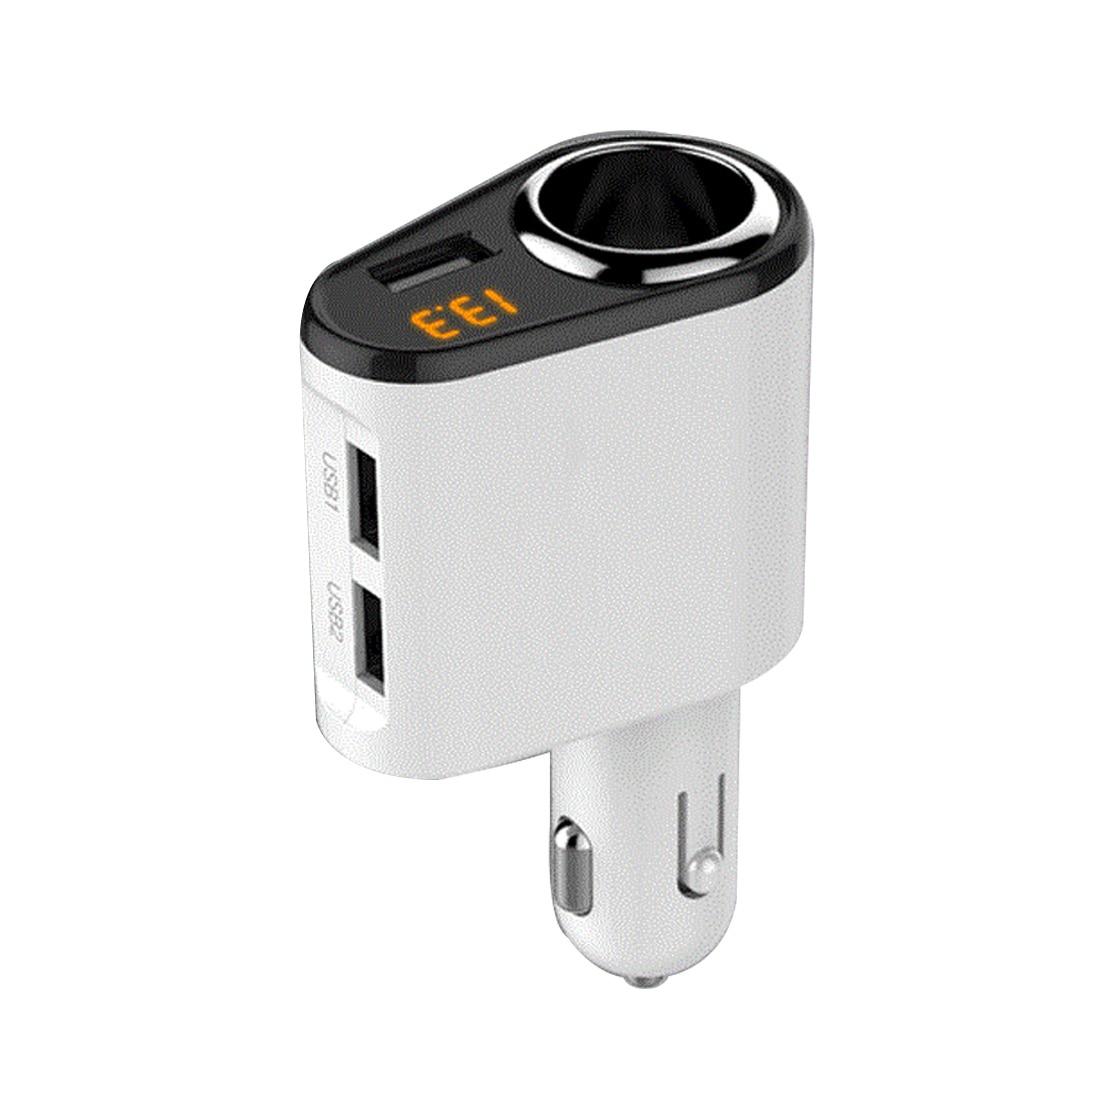 Etmakit Useful Car Charger 3 USB Ports 5V 3.1A Car-Charger 1 Socket Cigarette Lighter Splitter Quick Charger for Mobile Phone